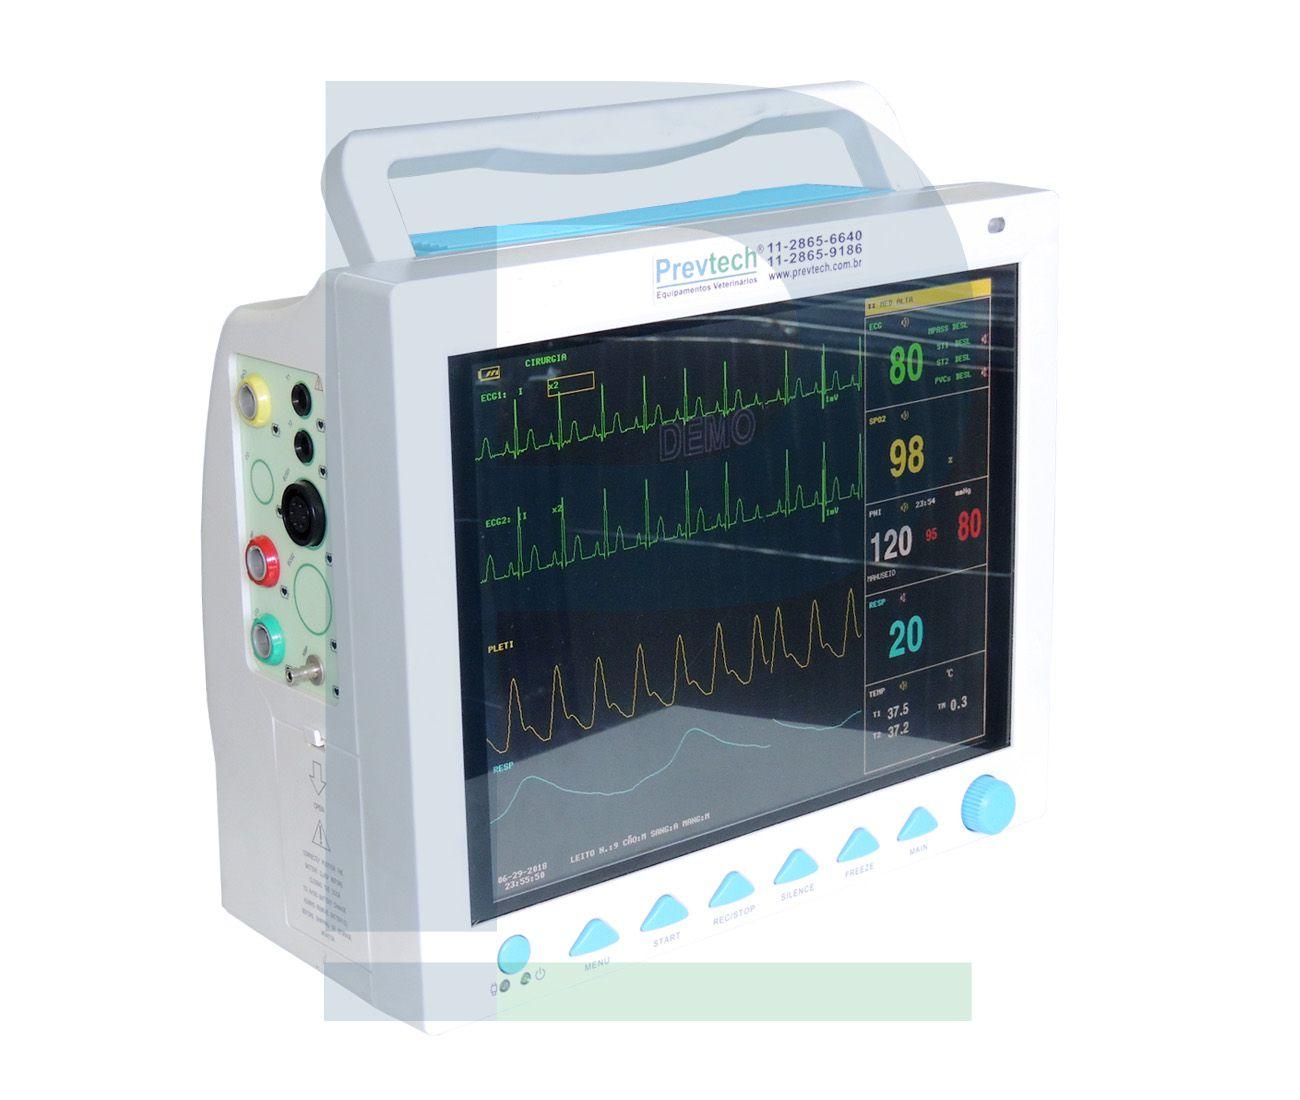 B - Monitor Veterinário Multiparamétrico AB 1000 - 12 polegadas